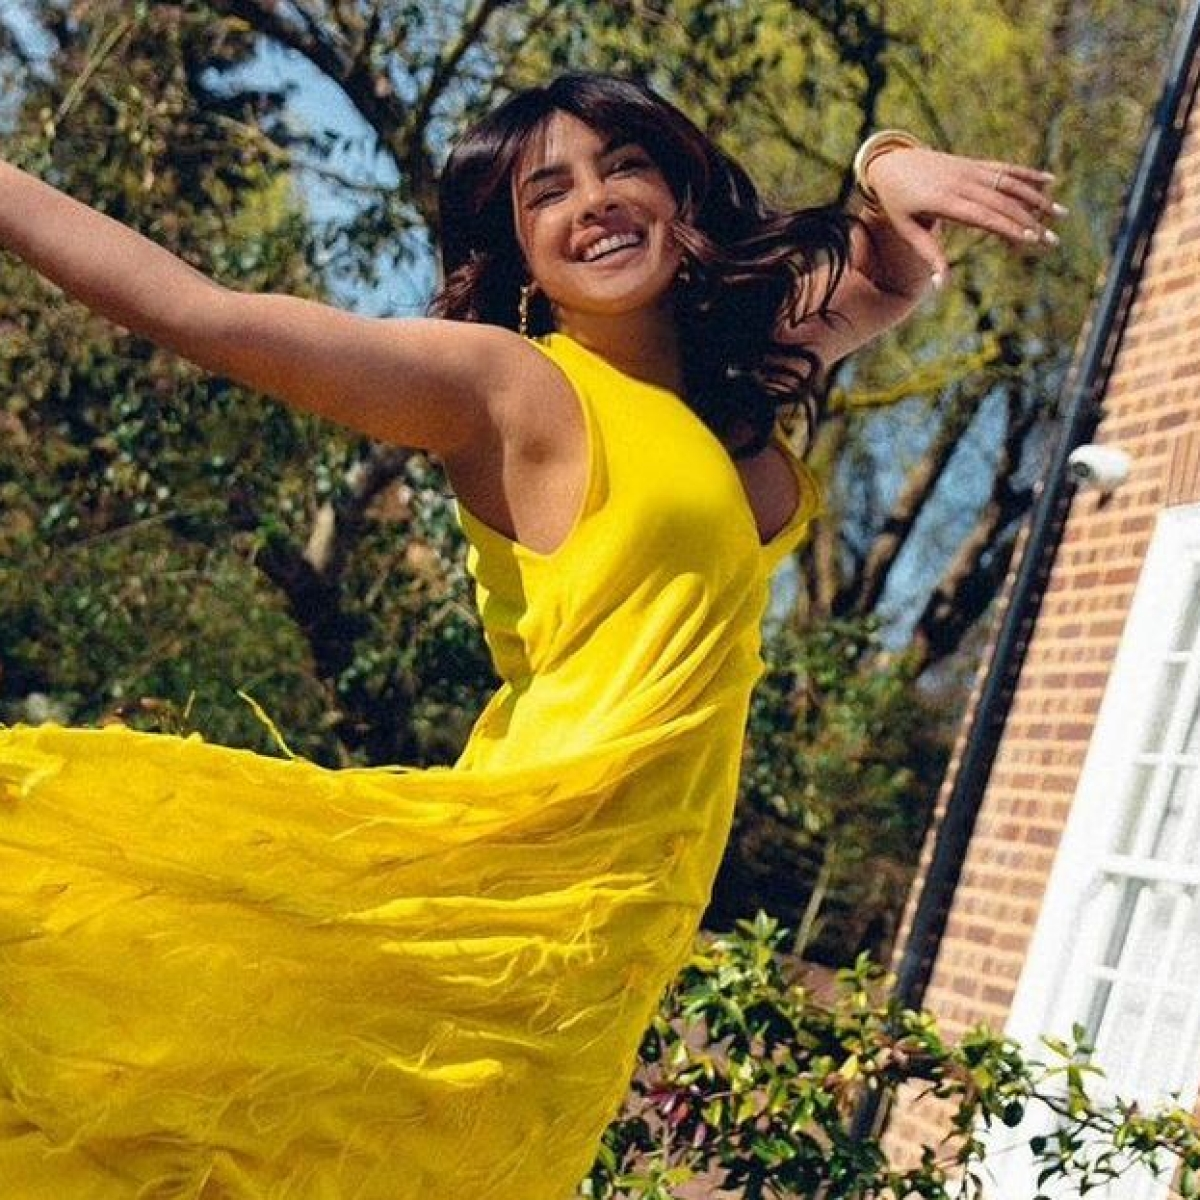 Priyanka Chopra wears Rs 4.4 lakh maxi dress to enjoy some sunshine in London